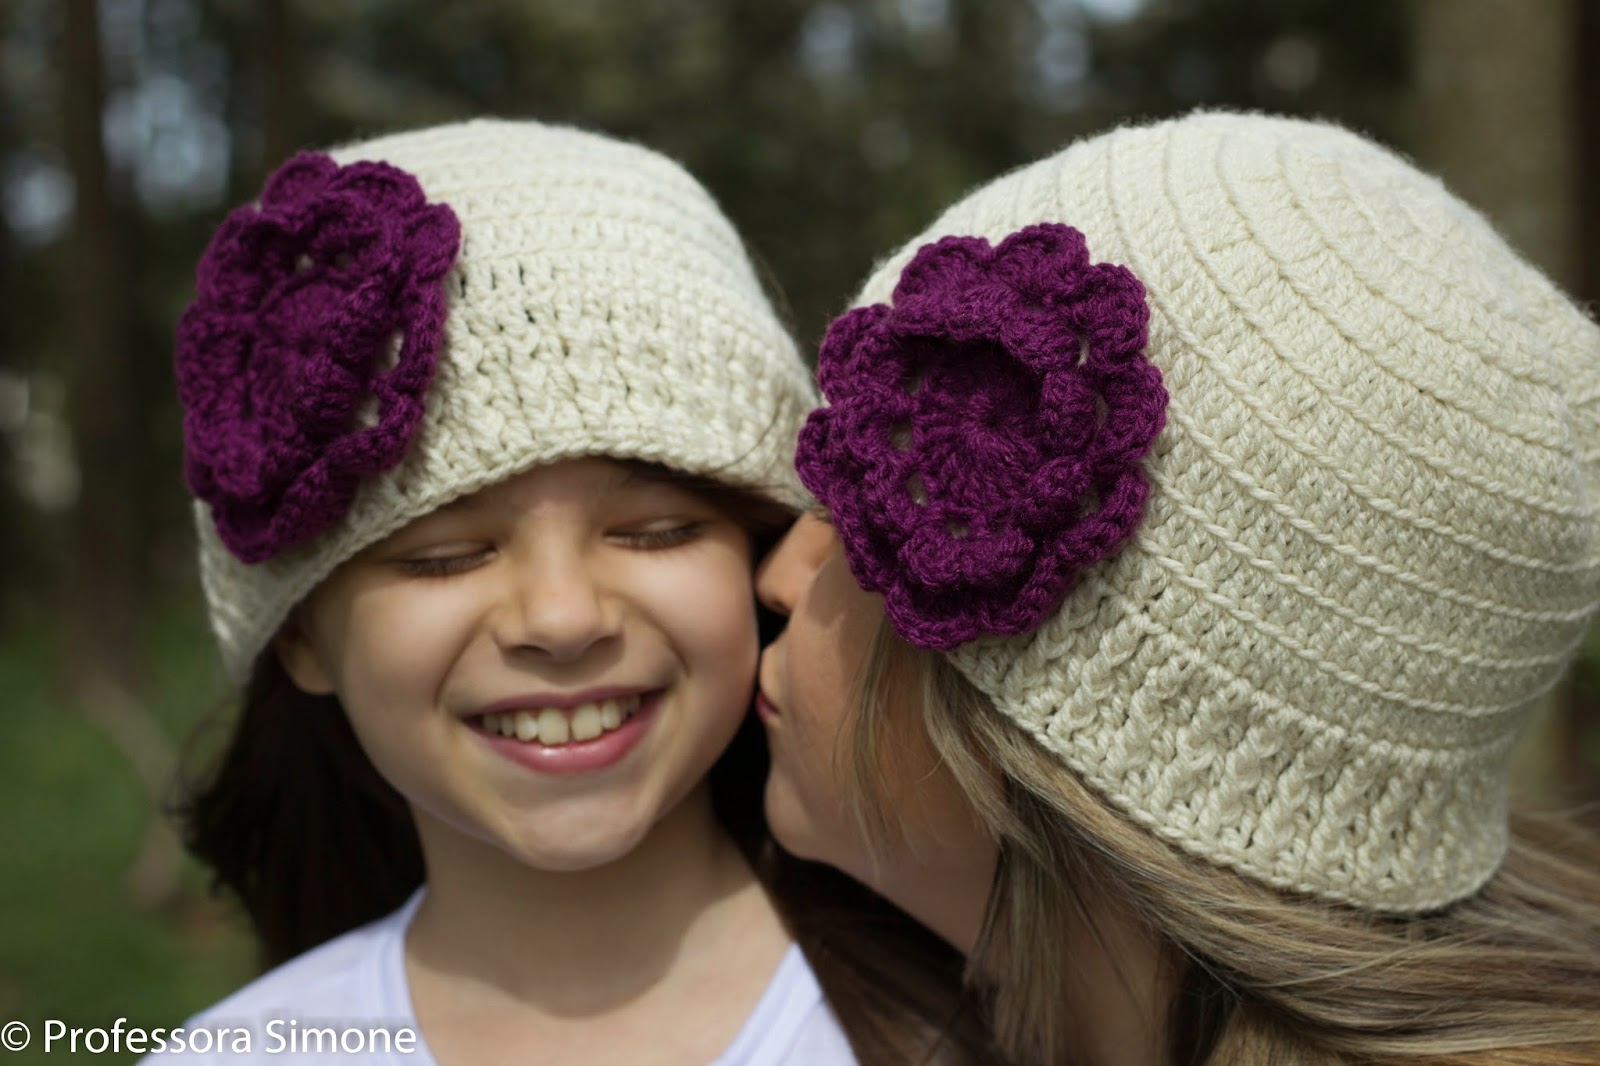 Dia das Mães - Touca   Gorro em crochê Mãe   Filha - Professora ... 2b5b54b25b9